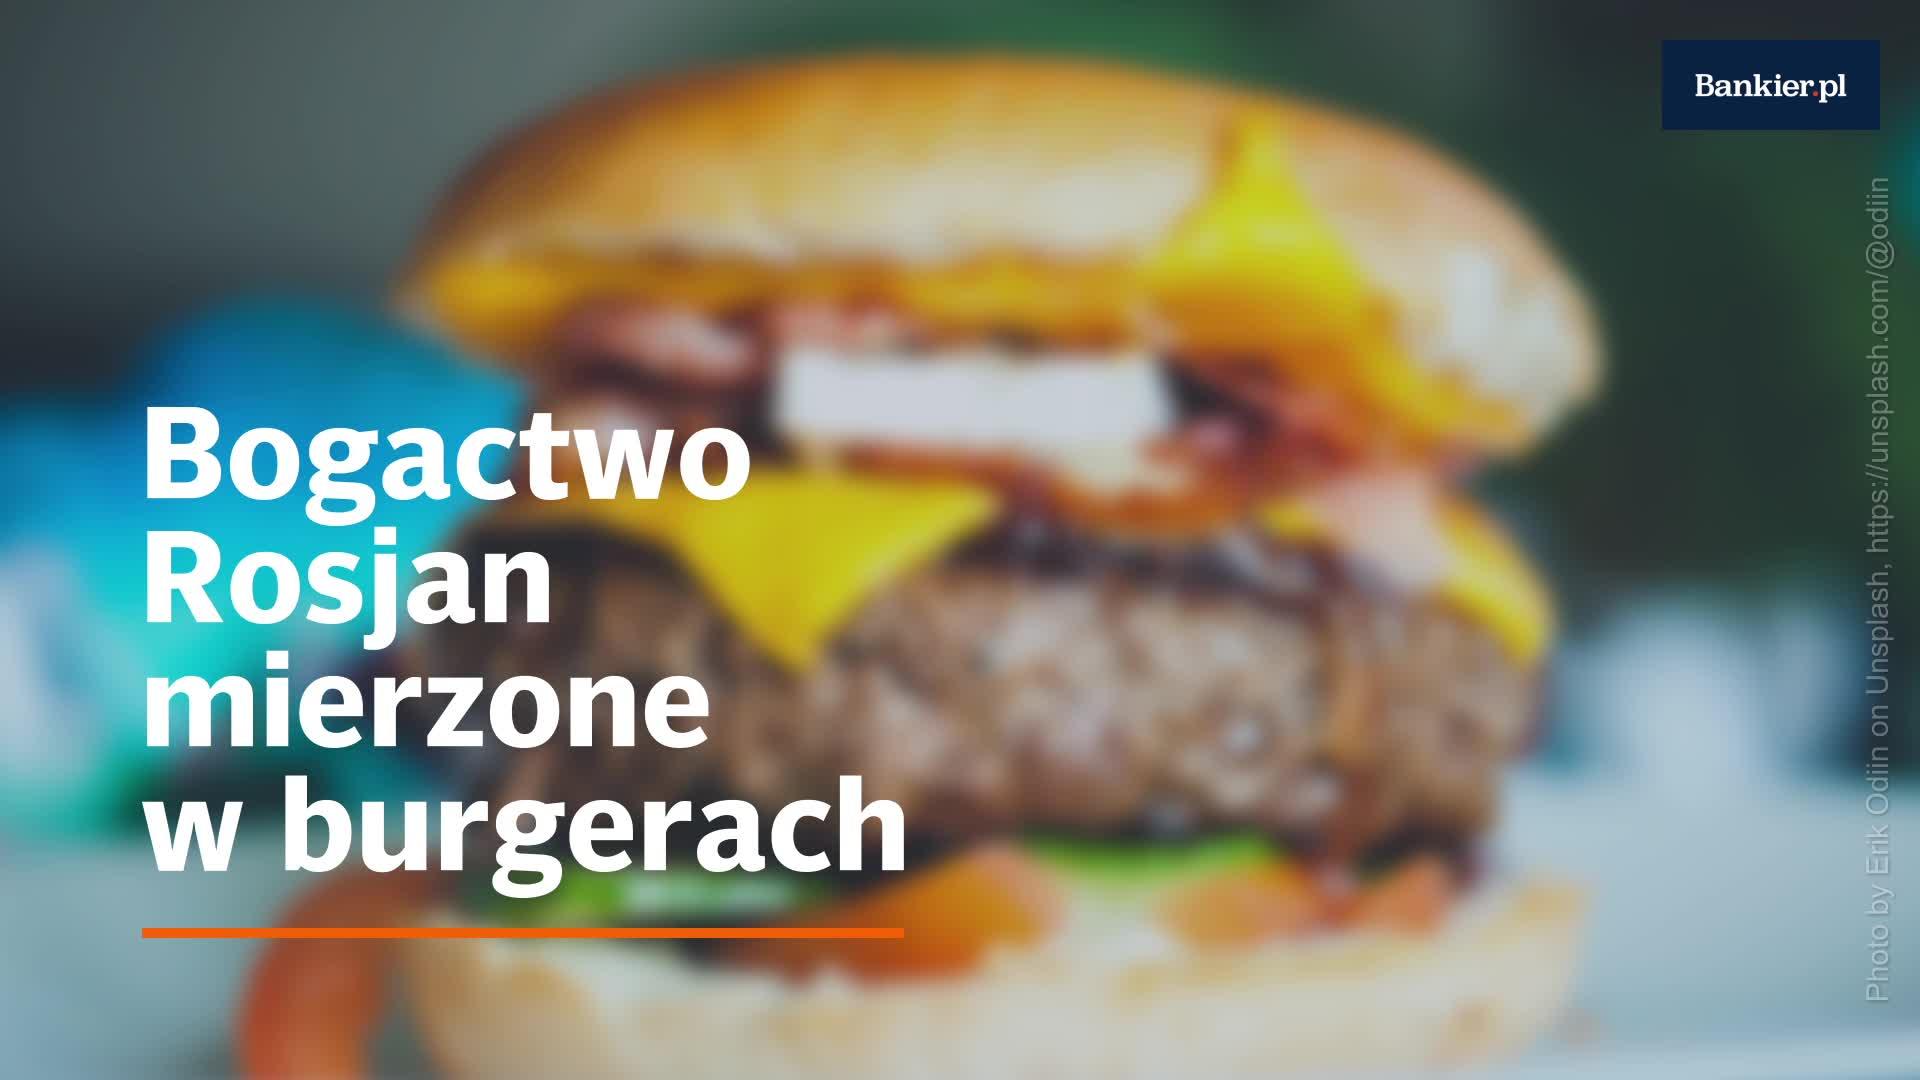 Bogactwo Rosjan mierzone w burgerach